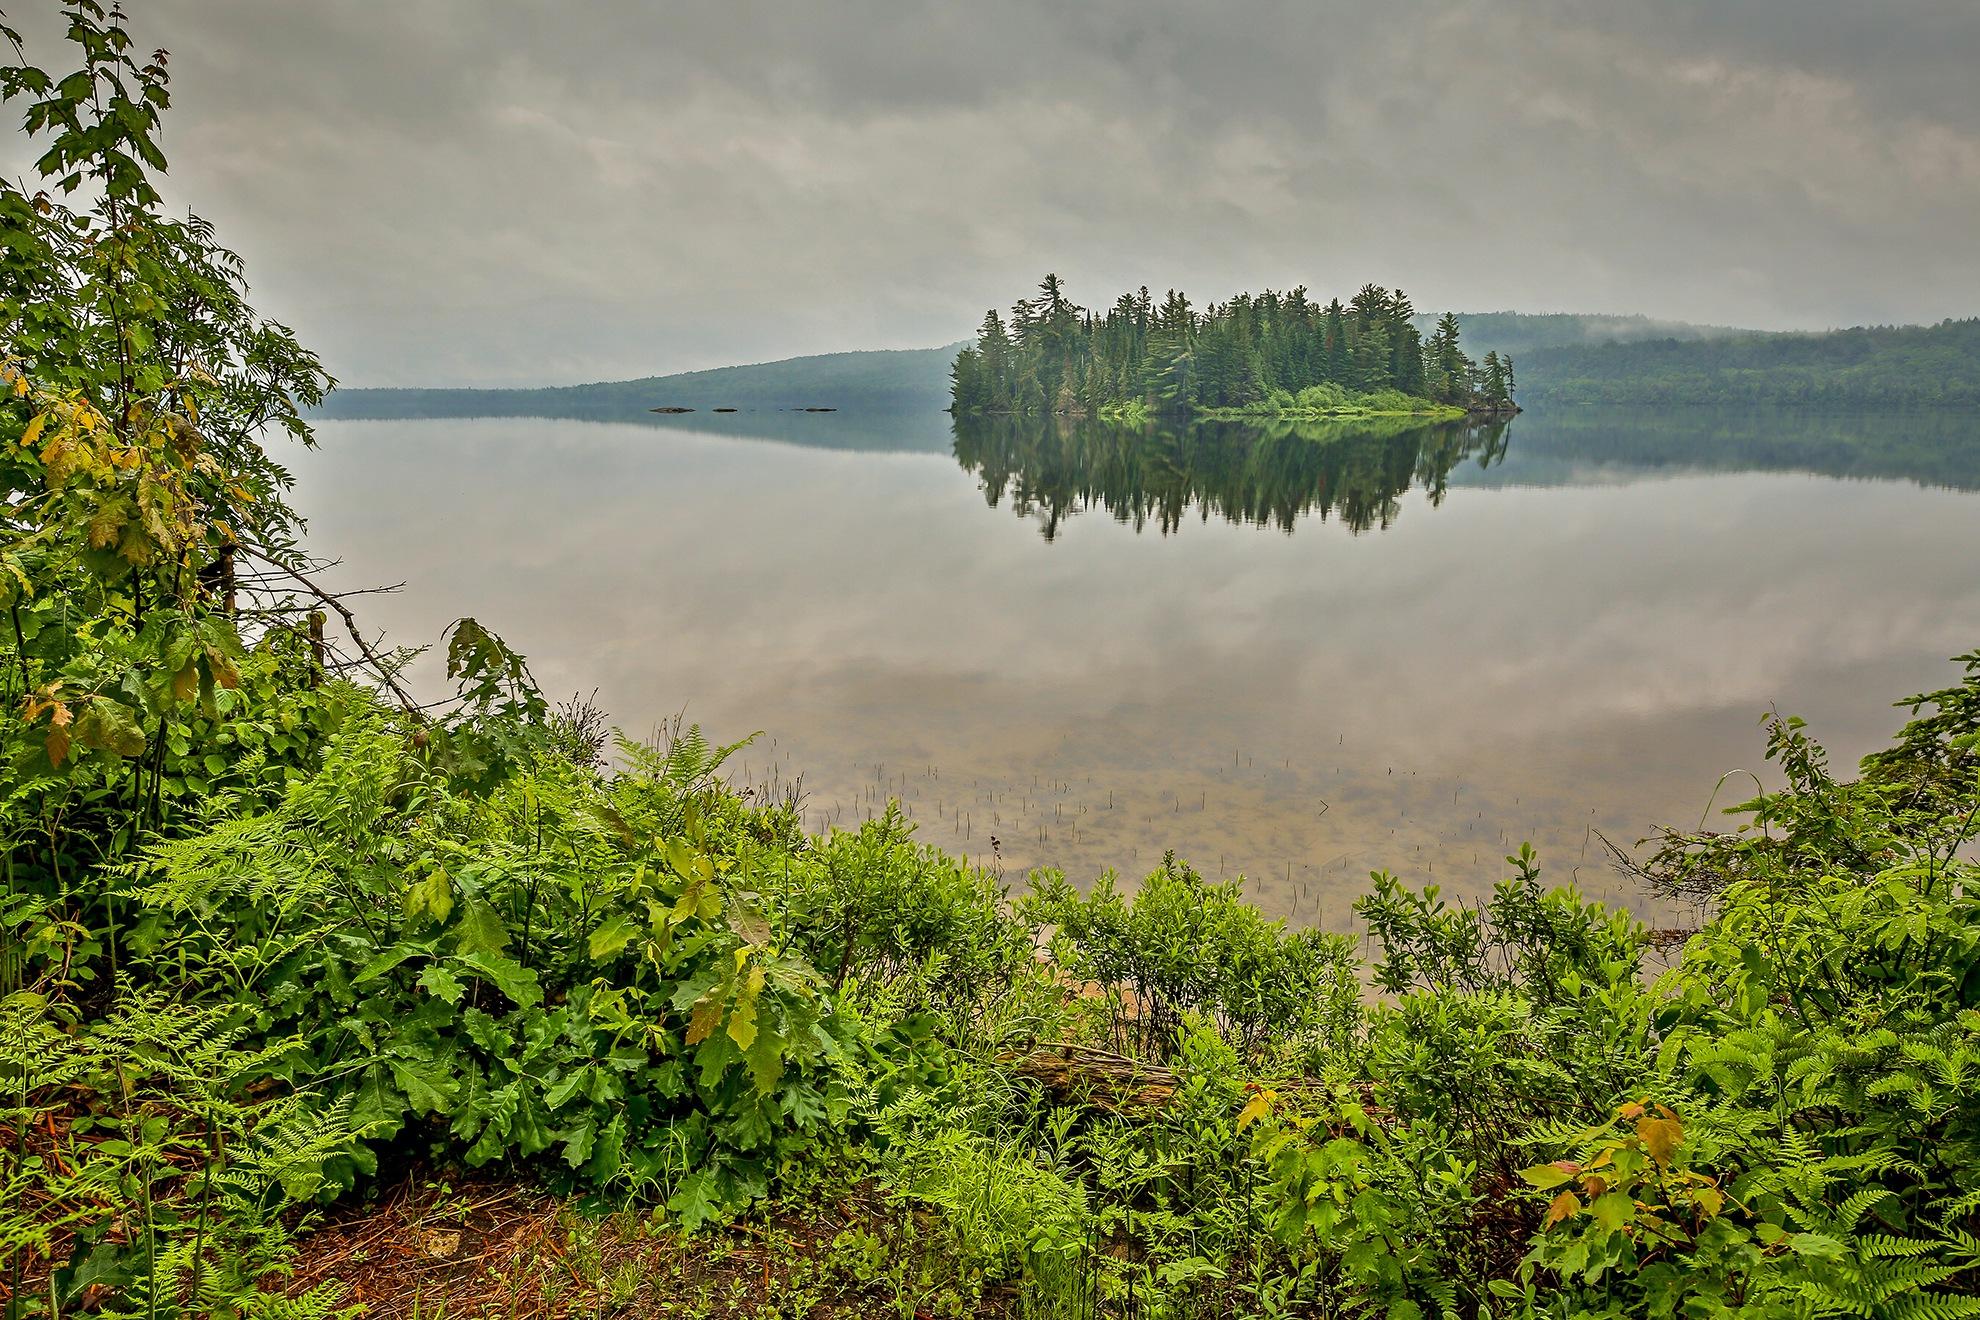 Misty Morning Island by Steve Dunsford